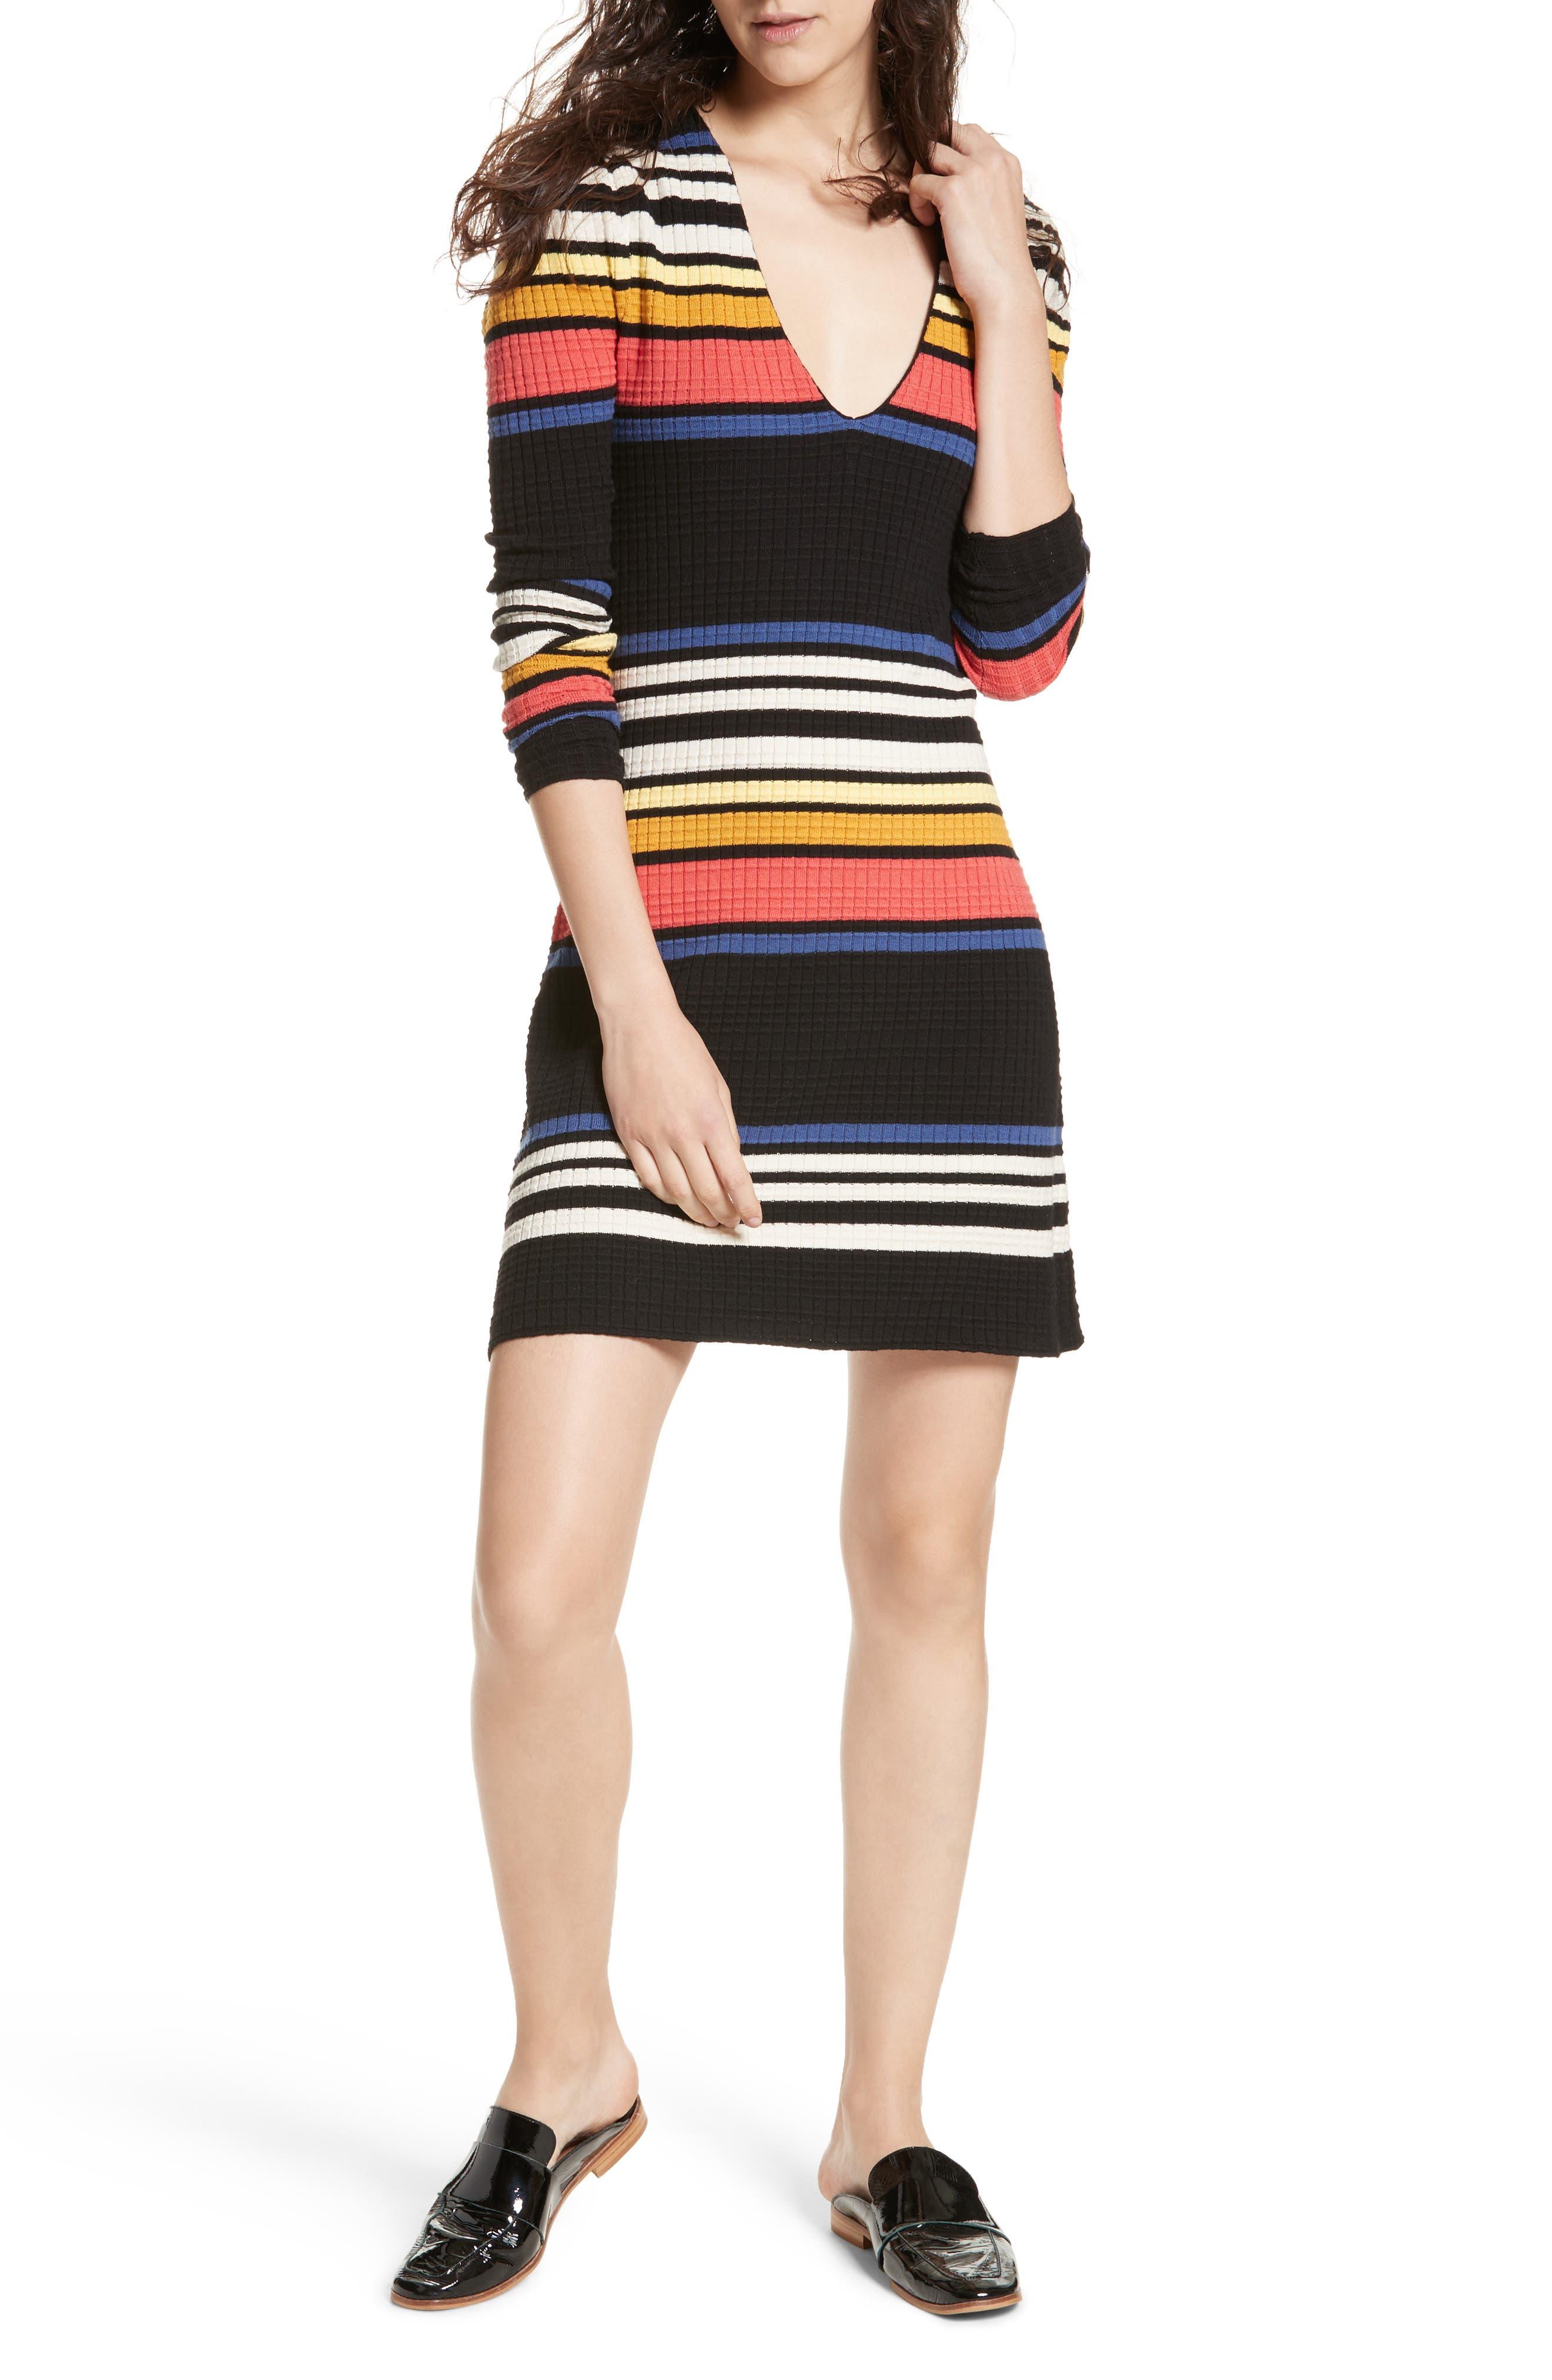 Alternate Image 1 Selected - Free People Gidget Sweater Dress